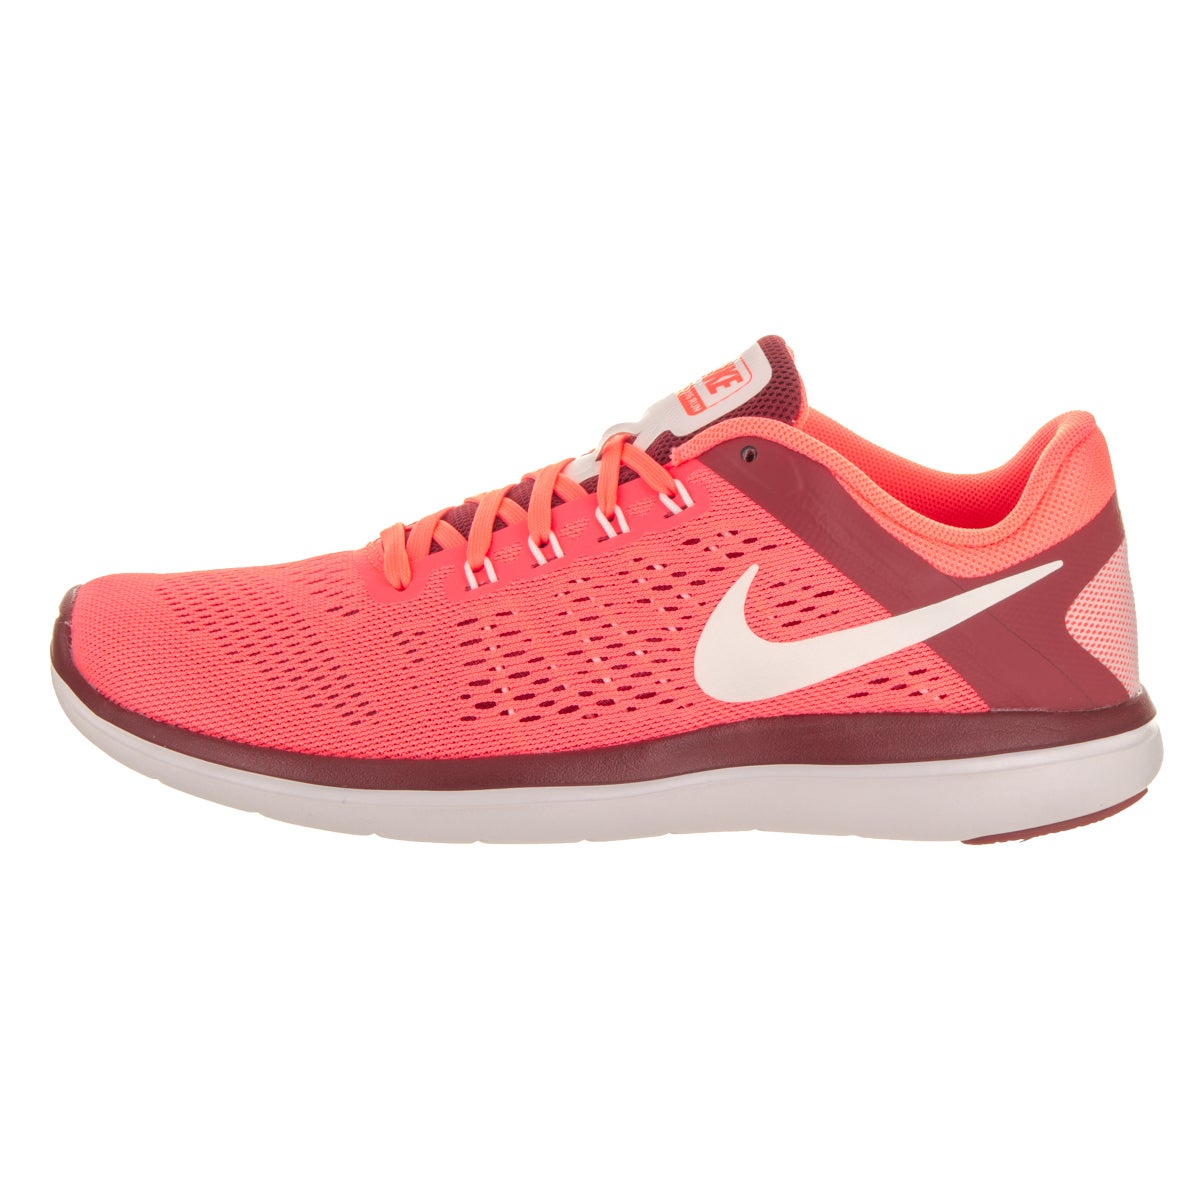 low cost 8893b 73609 Shop Nike Women's Flex 2016 Rn Running Shoe - Free Shipping Today -  Overstock - 14092769